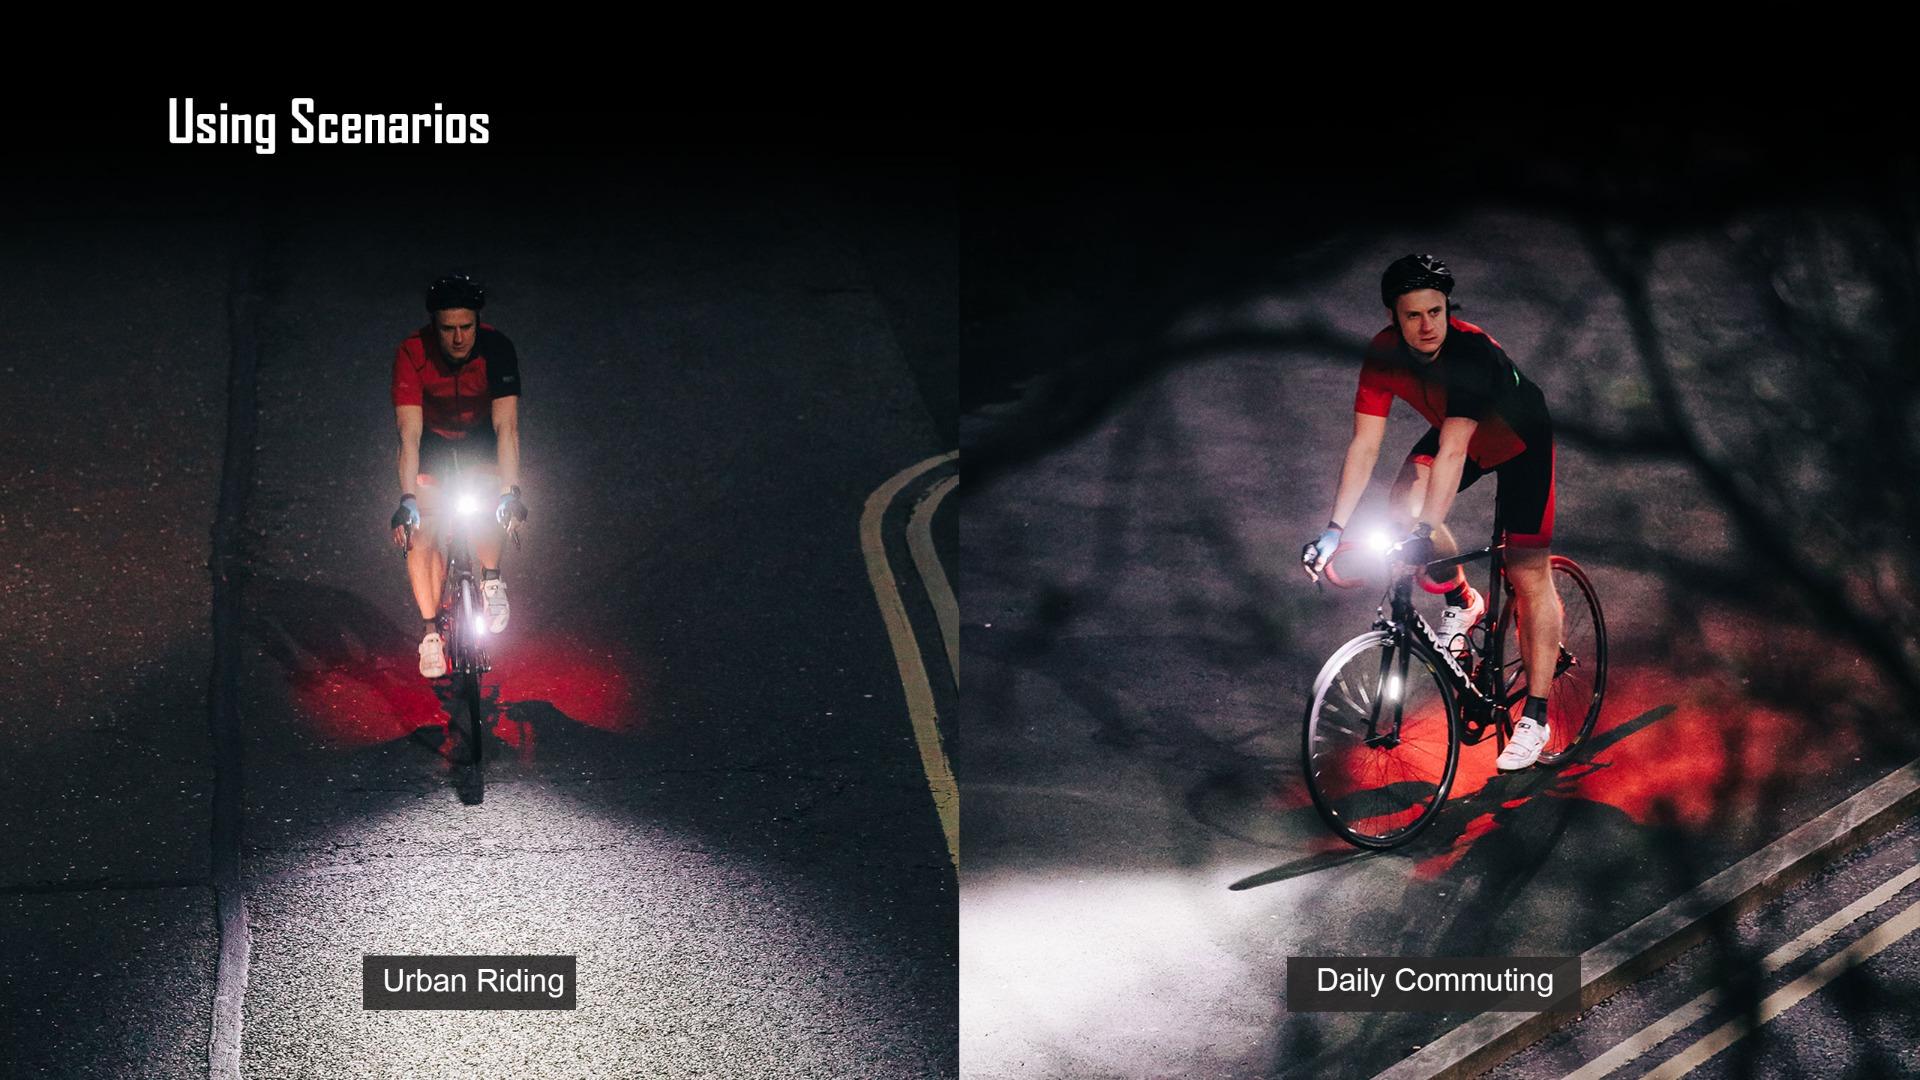 Olight RN 400 Bike LED Light Headlight Using Scenios